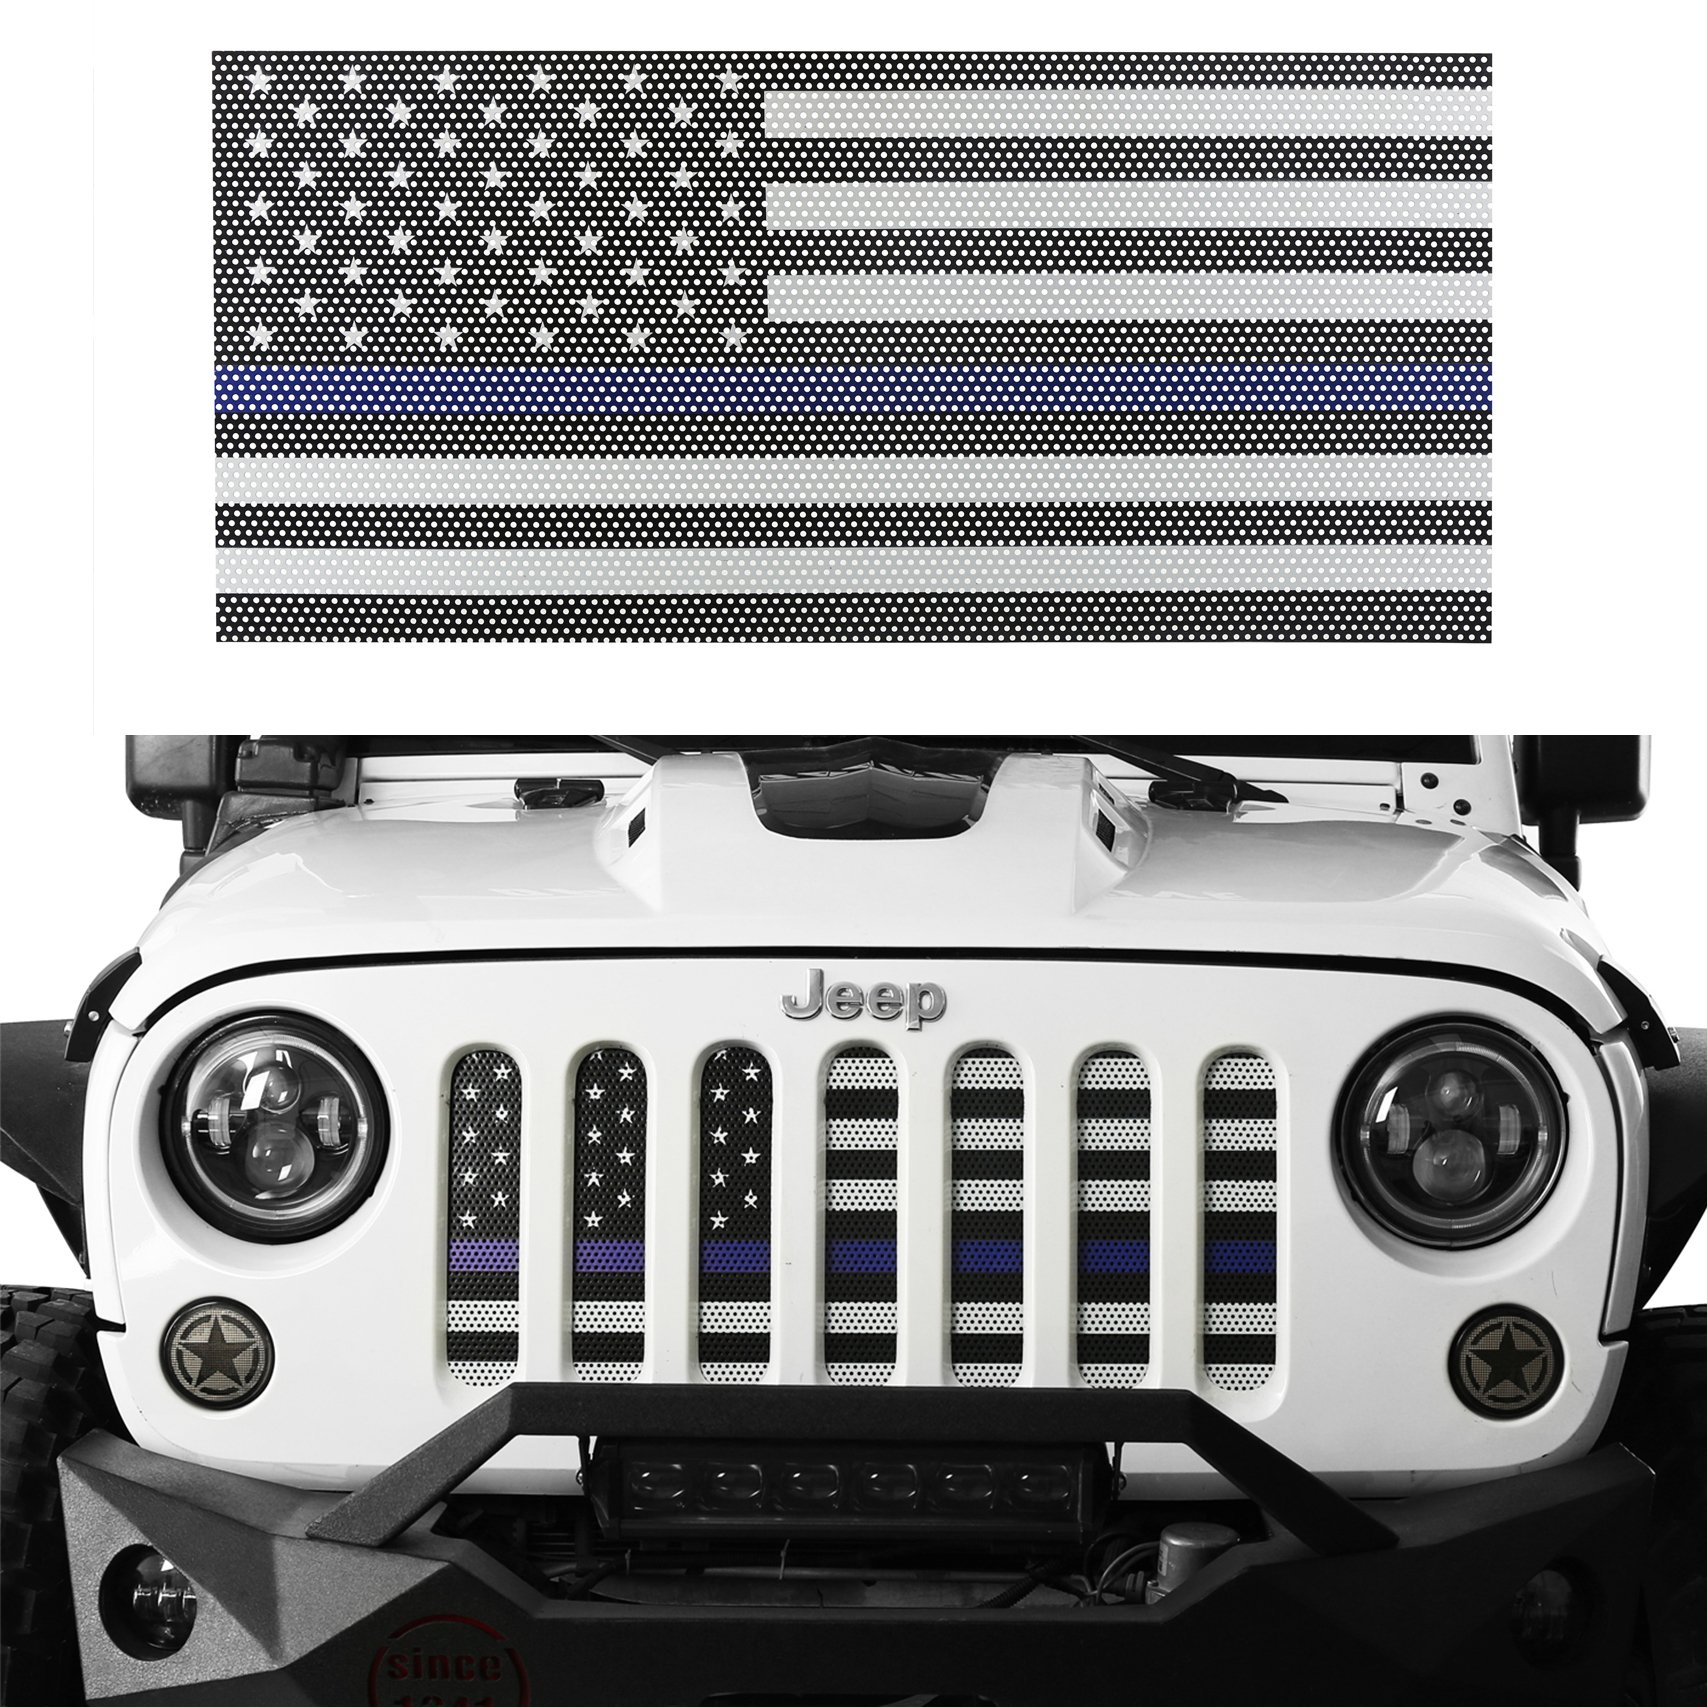 Hooke Road Jeep Wrangler Grill Screen American Flag Grille Insert Bug Deflector for 2007-2018 Jeep Wrangler JK & Wrangler Unlimited (Thin Blue Line)